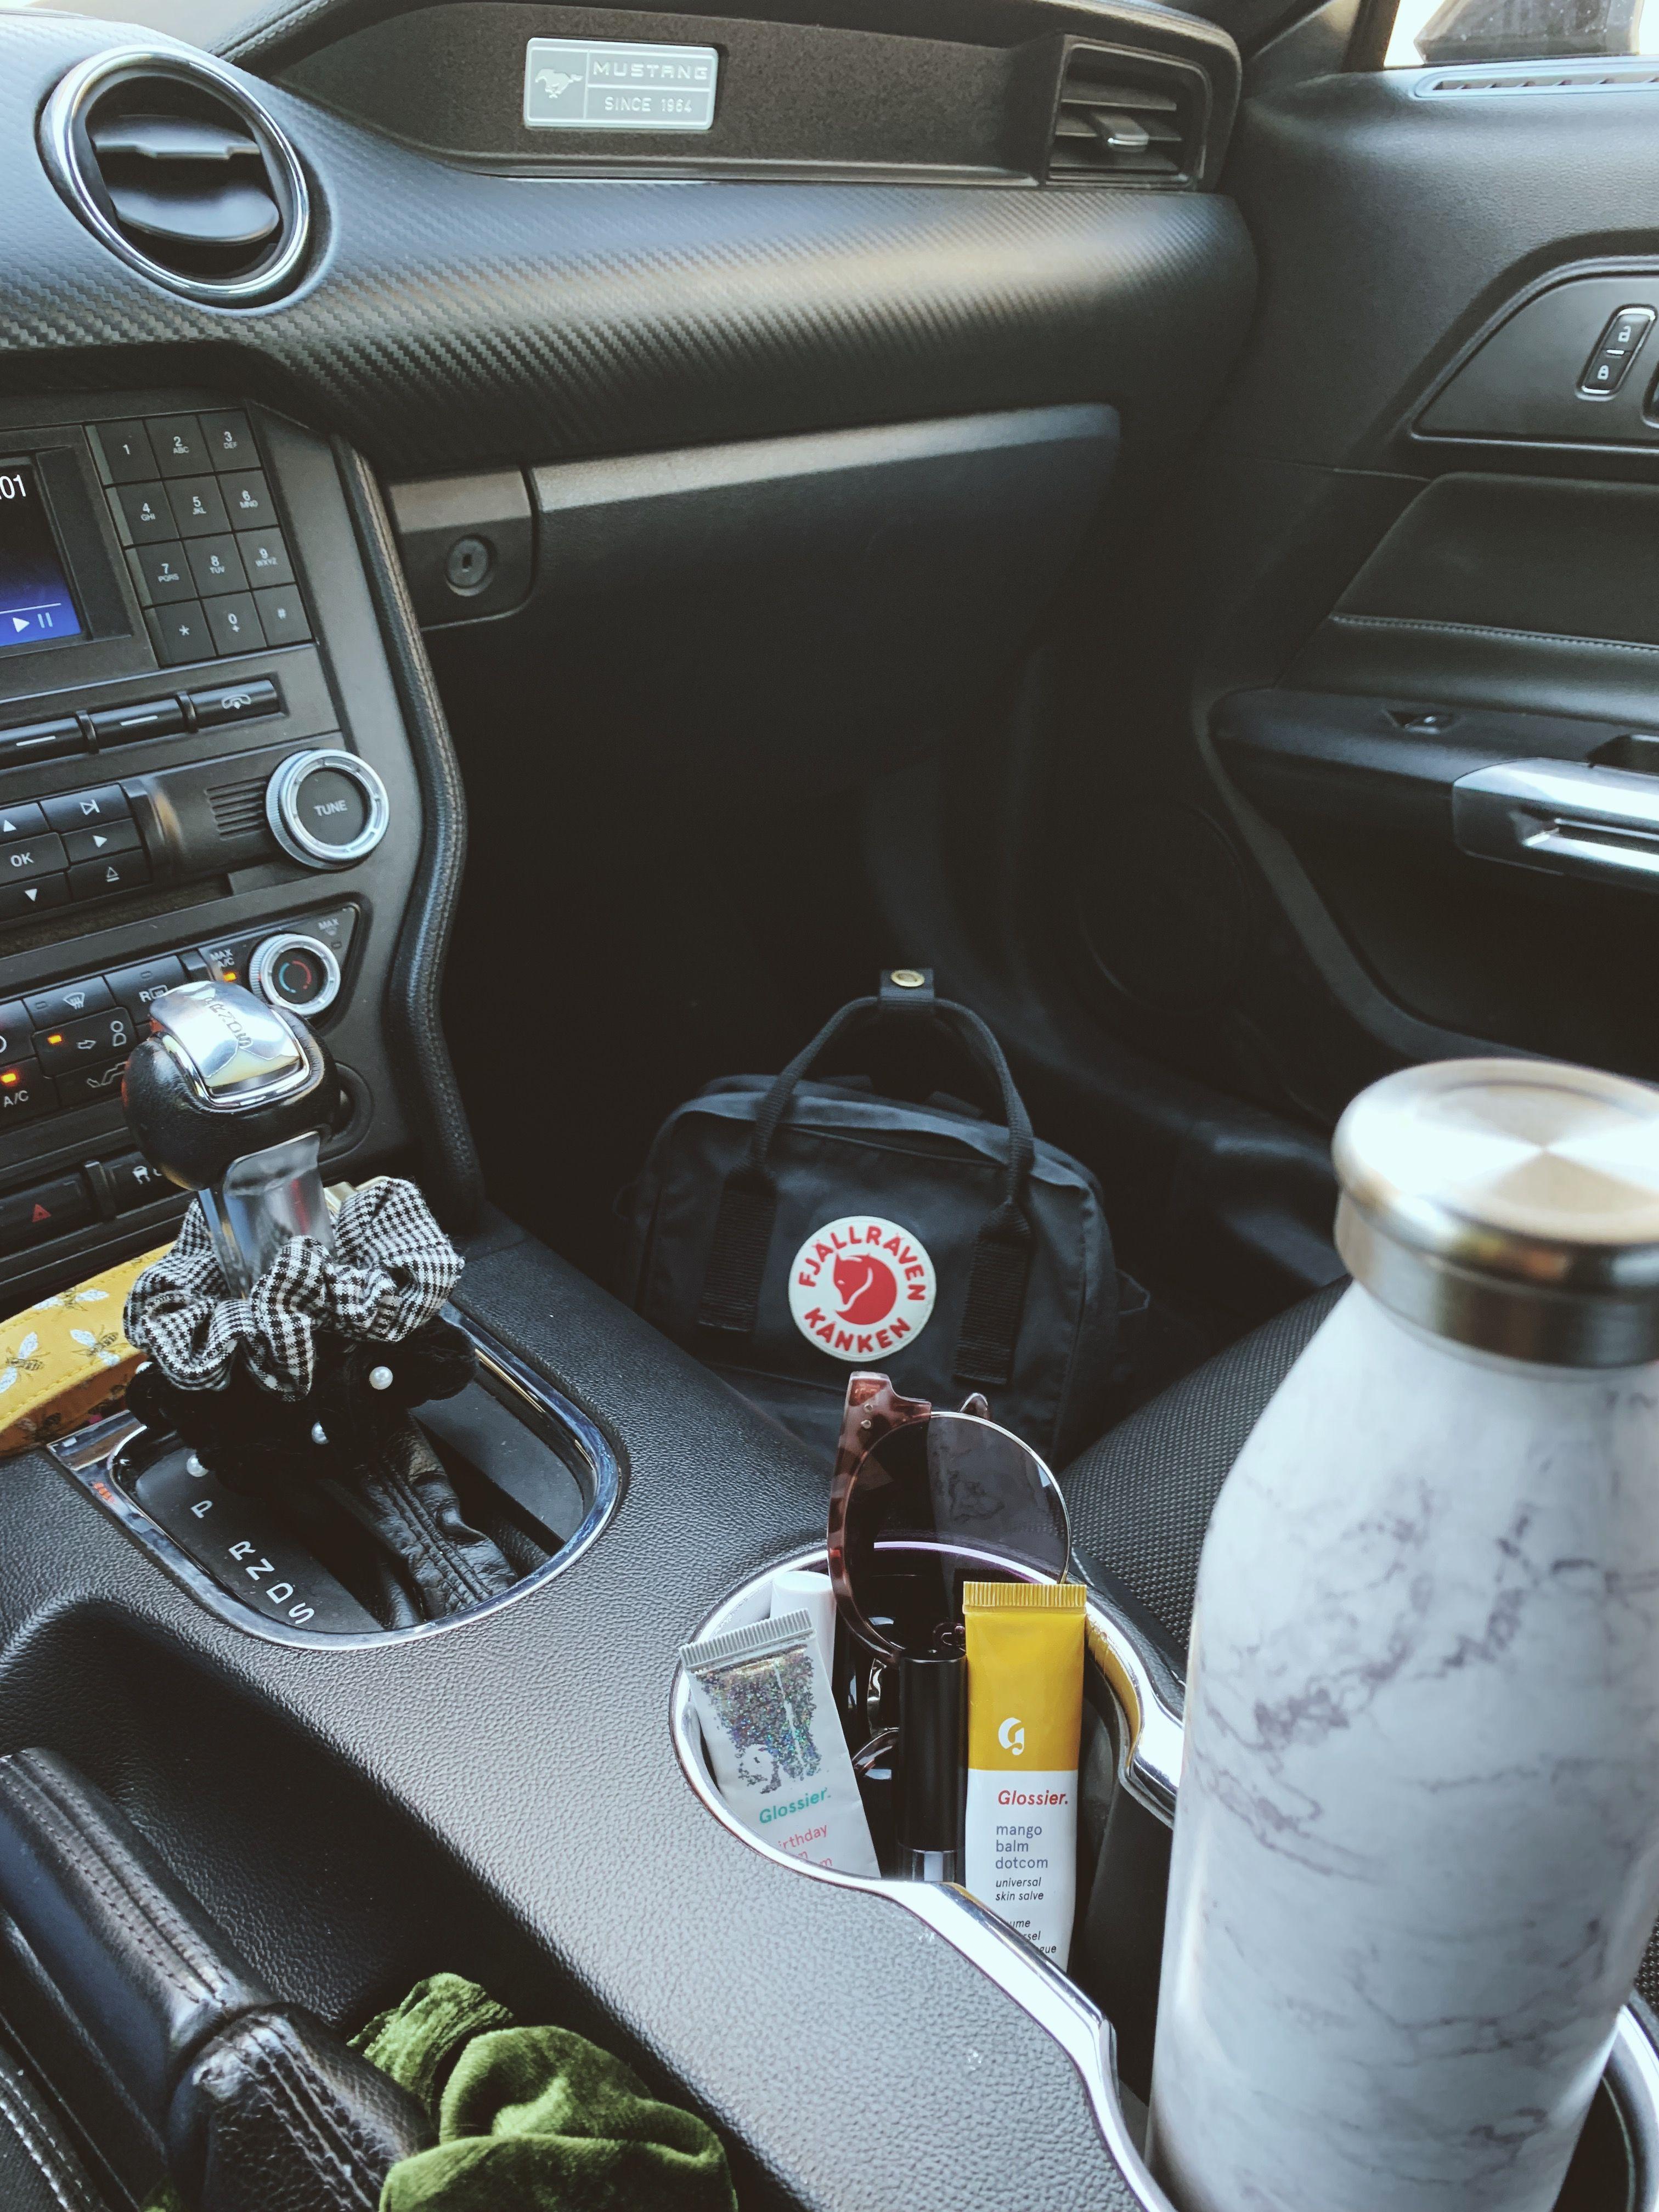 Aesthetic Car Car Interior Accessories Car Interior Girly Car Accessories